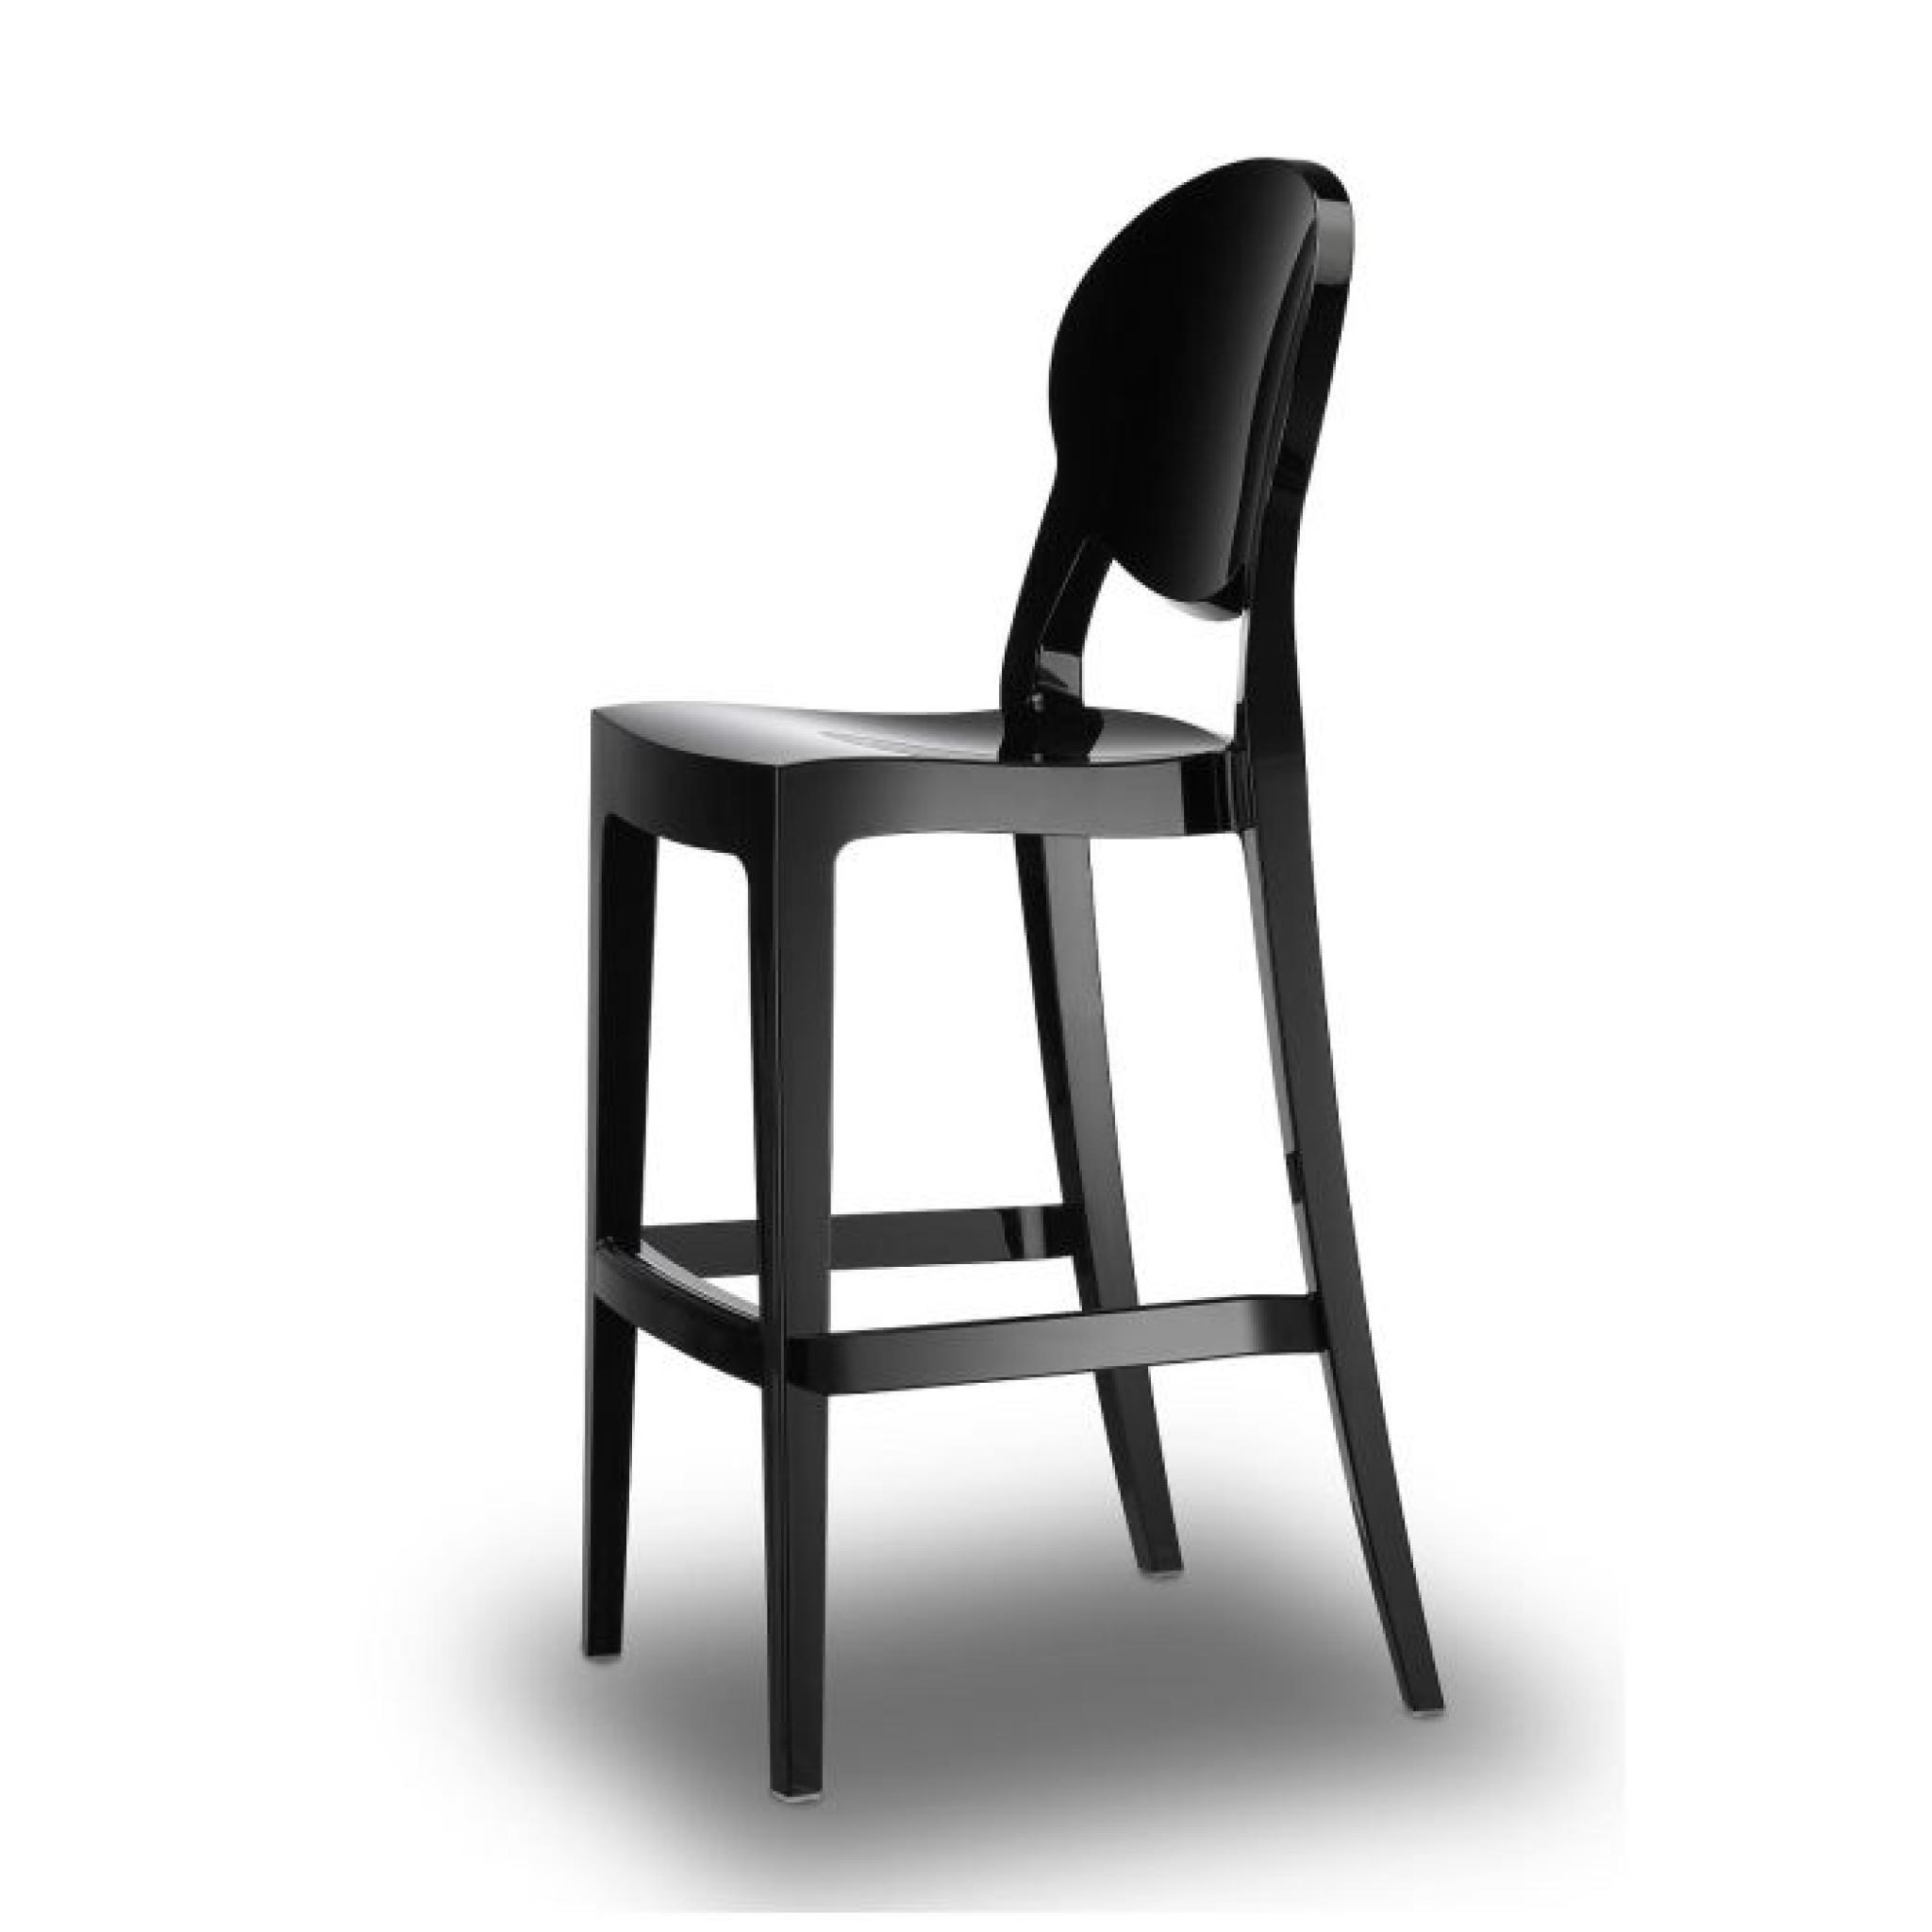 tabouret de bar noir design igloo barstool no achat vente tabouret de bar pas cher. Black Bedroom Furniture Sets. Home Design Ideas